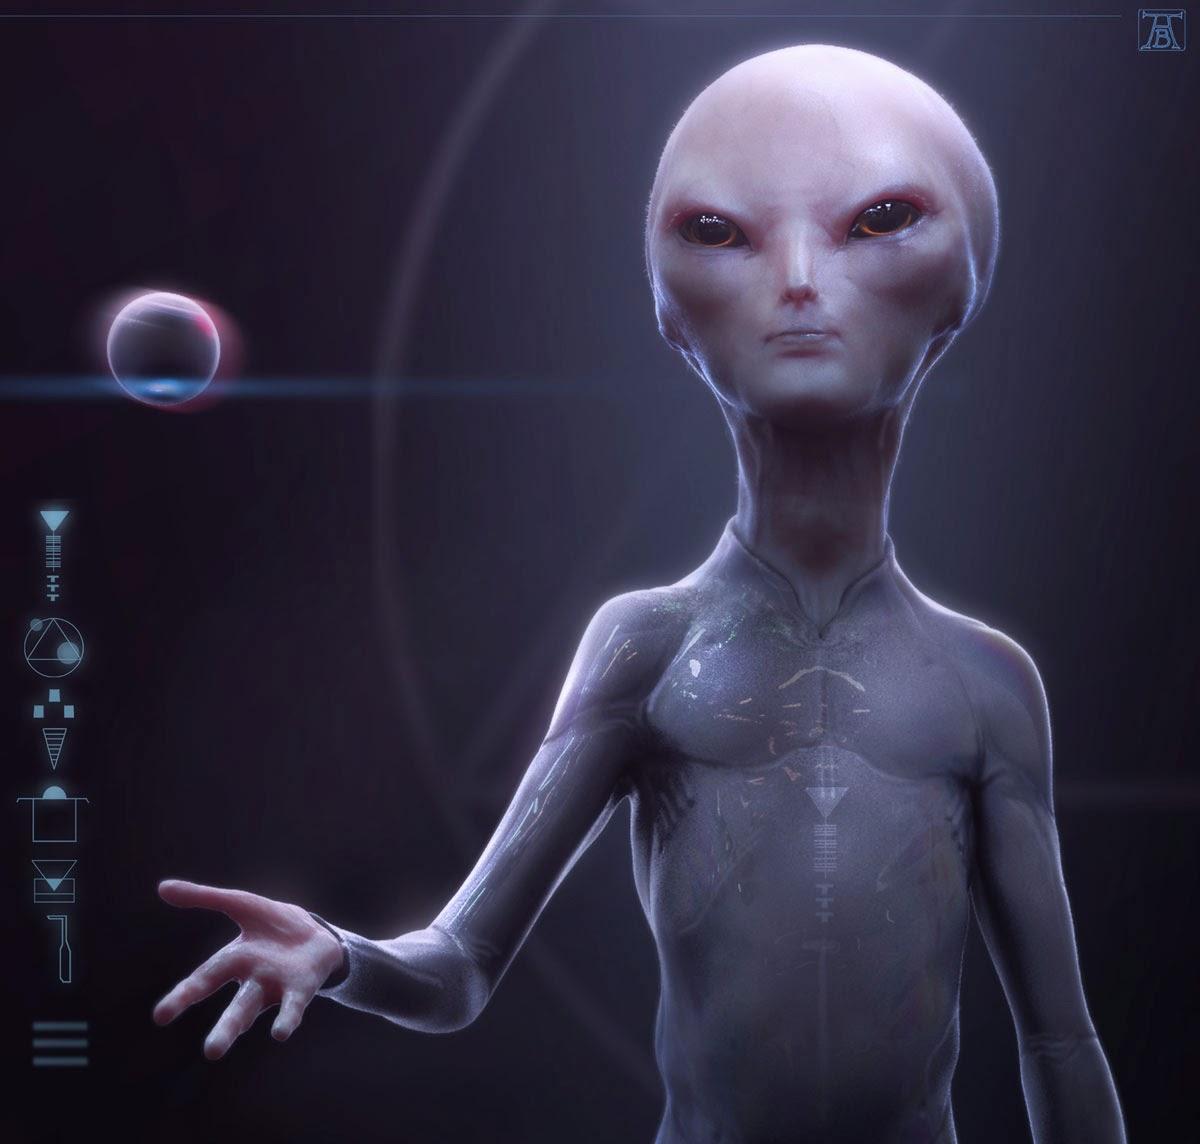 Alien_ClassicGrey_FullBodClseUp2_abaker.